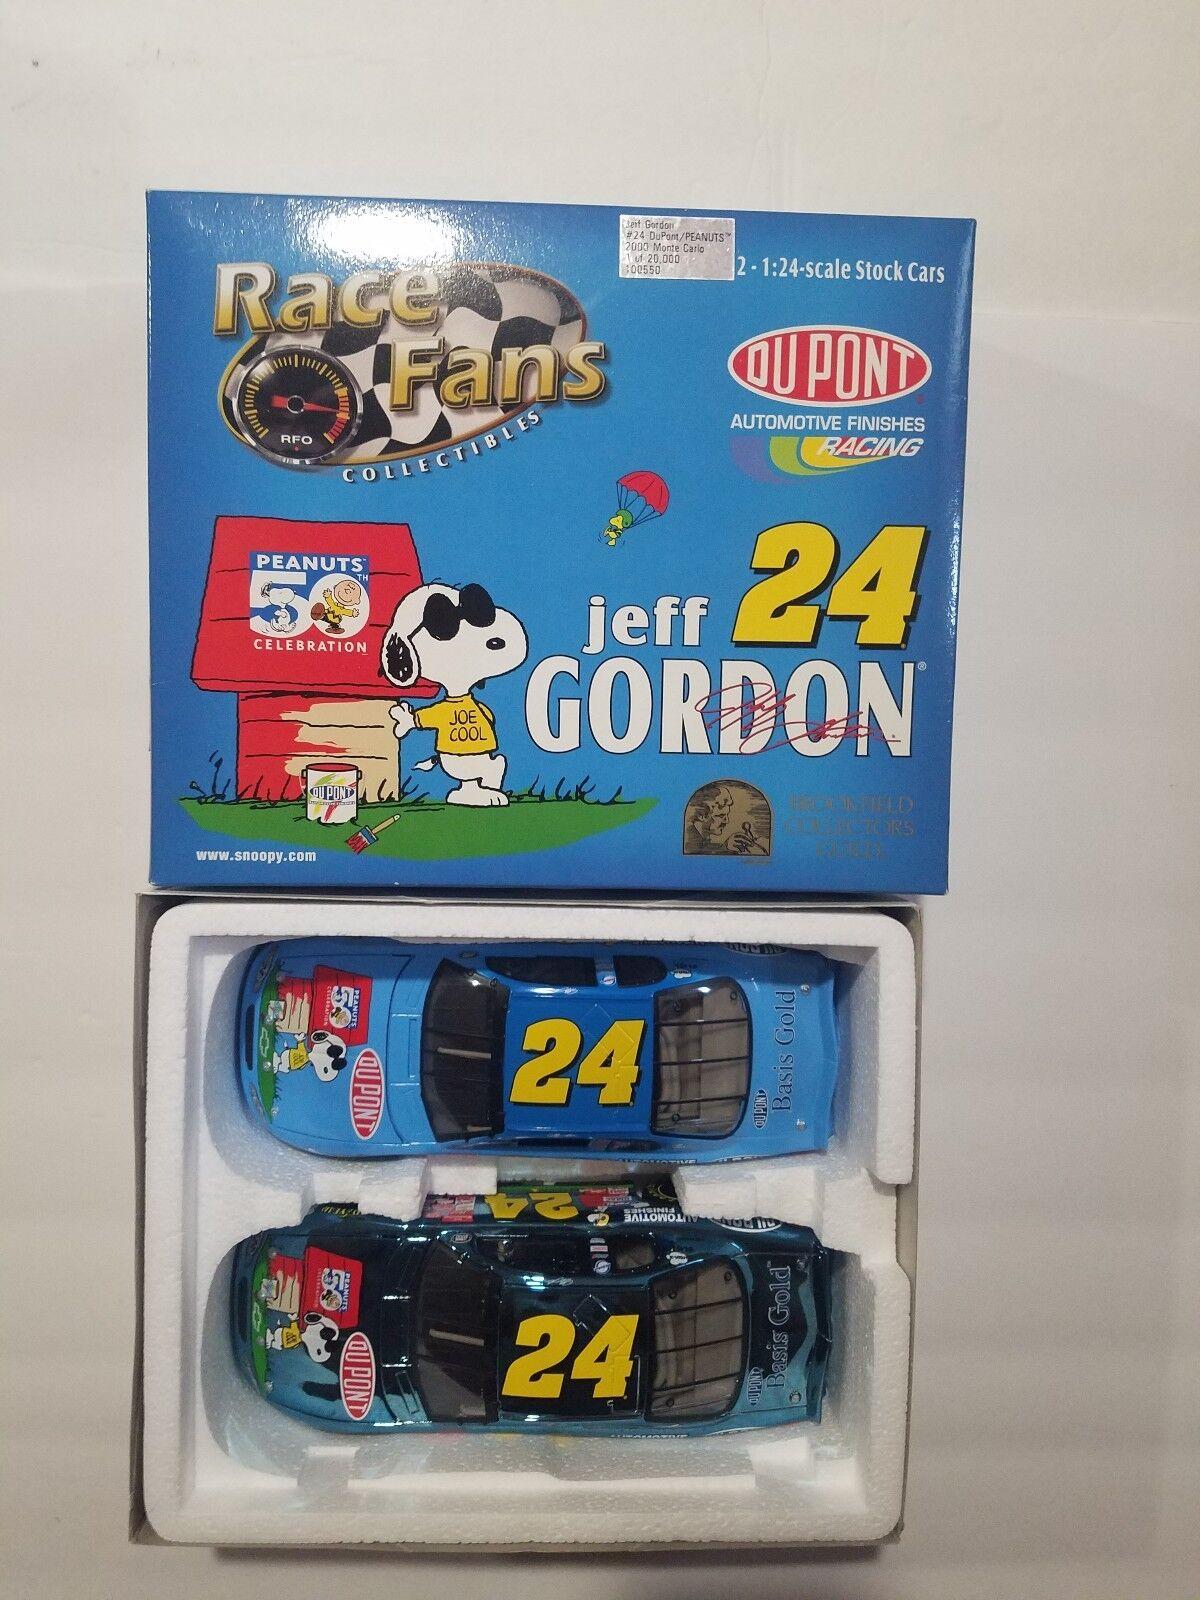 Jeff Gordon numéro 24 Dupont Peanuts 2000 MONTE CARLO 1 de 20,000 2 - 1 24